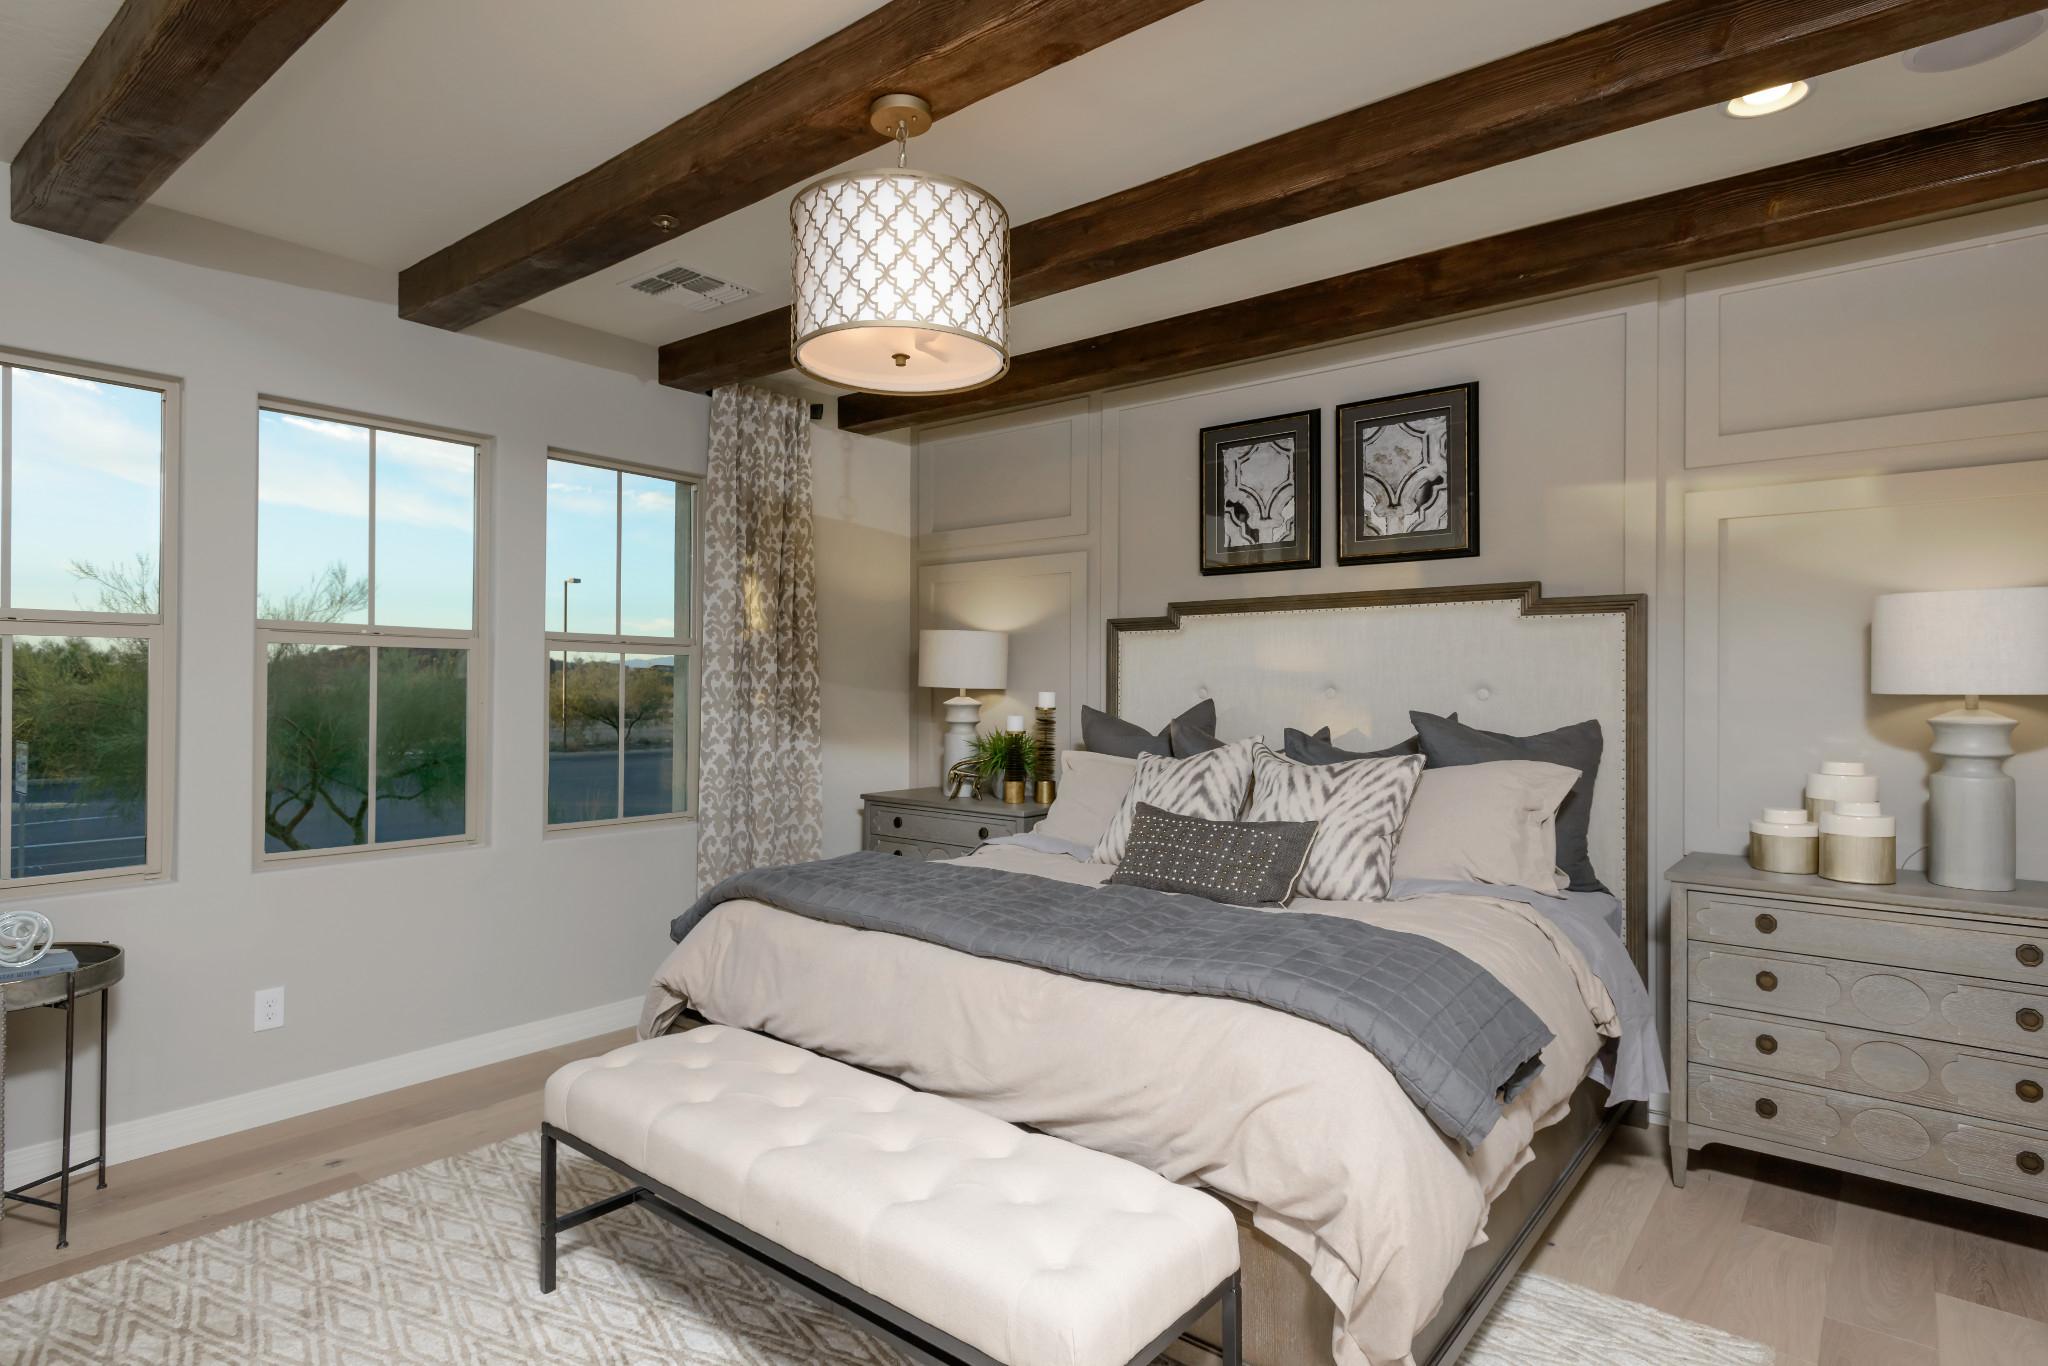 24 North 1002 Polaris Plan Master Bedroom